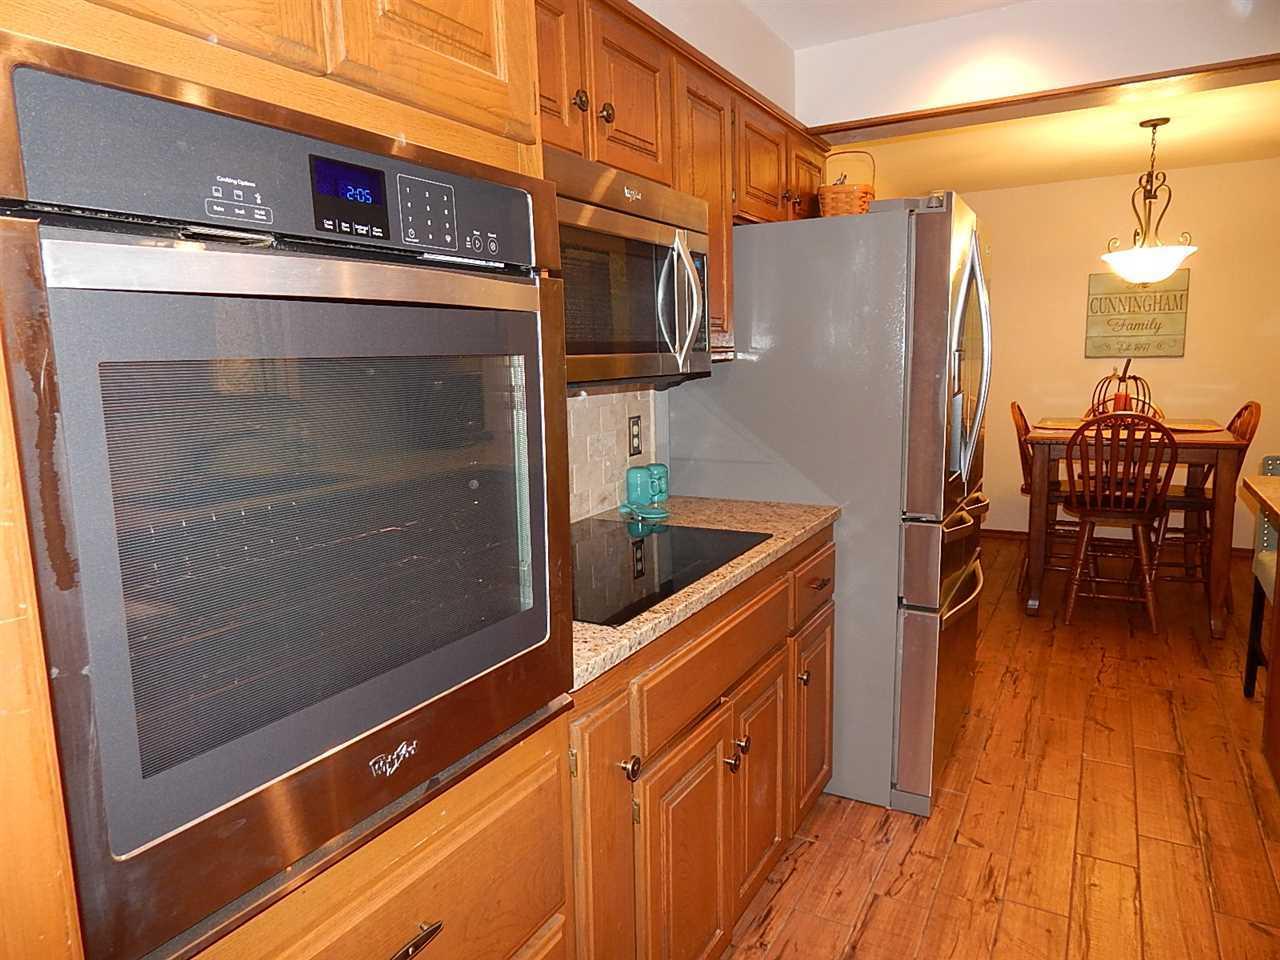 Sold Cross Sale W/ MLS | 2721 Wintergreen Ponca City, OK 74604 10